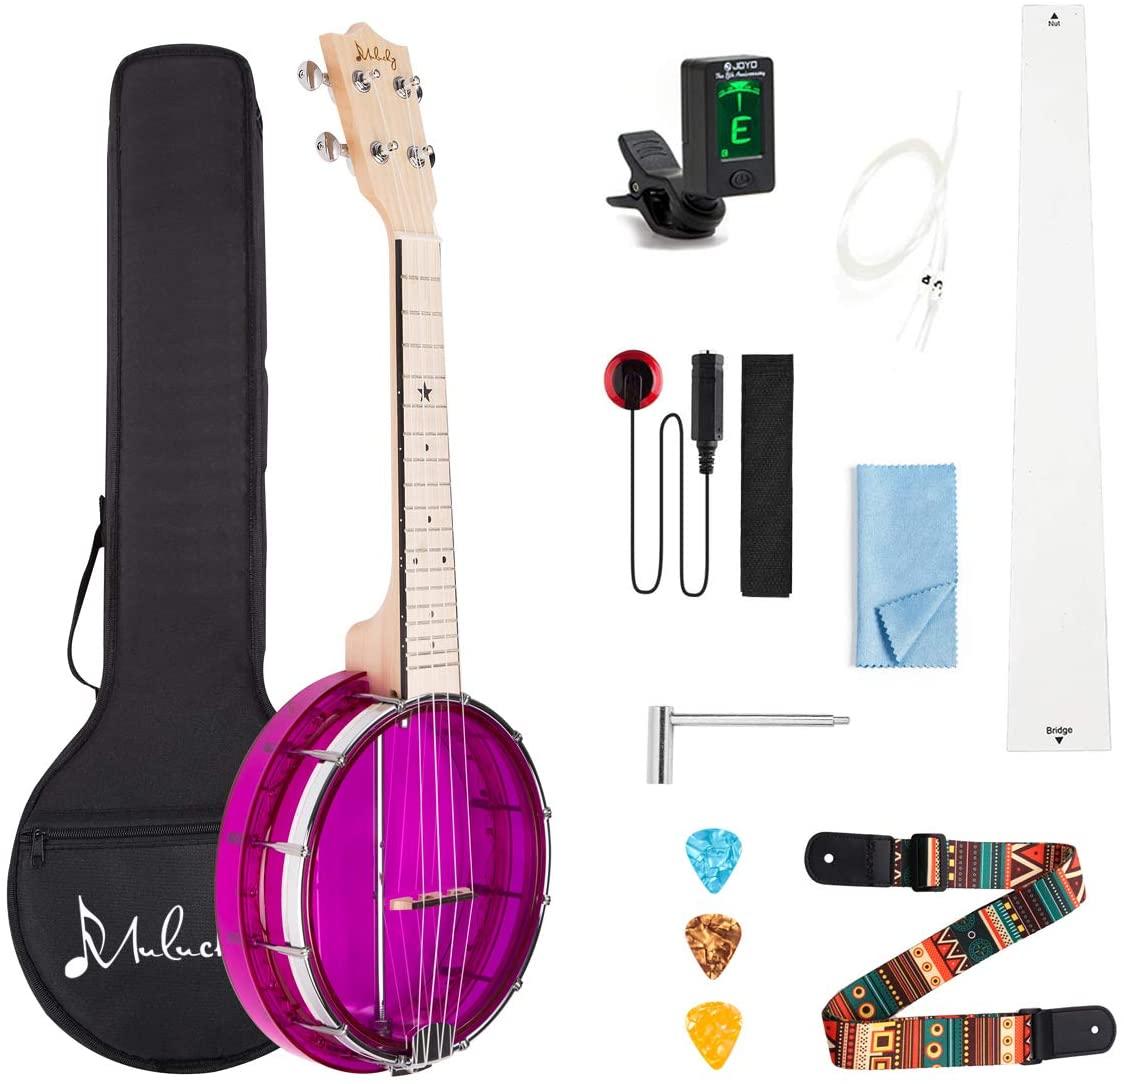 Mulucky 4-String Banjo Ukulele, Mini Banjo Ukes Purple With Gig Bag Tuner String Strap Picks - BU80P